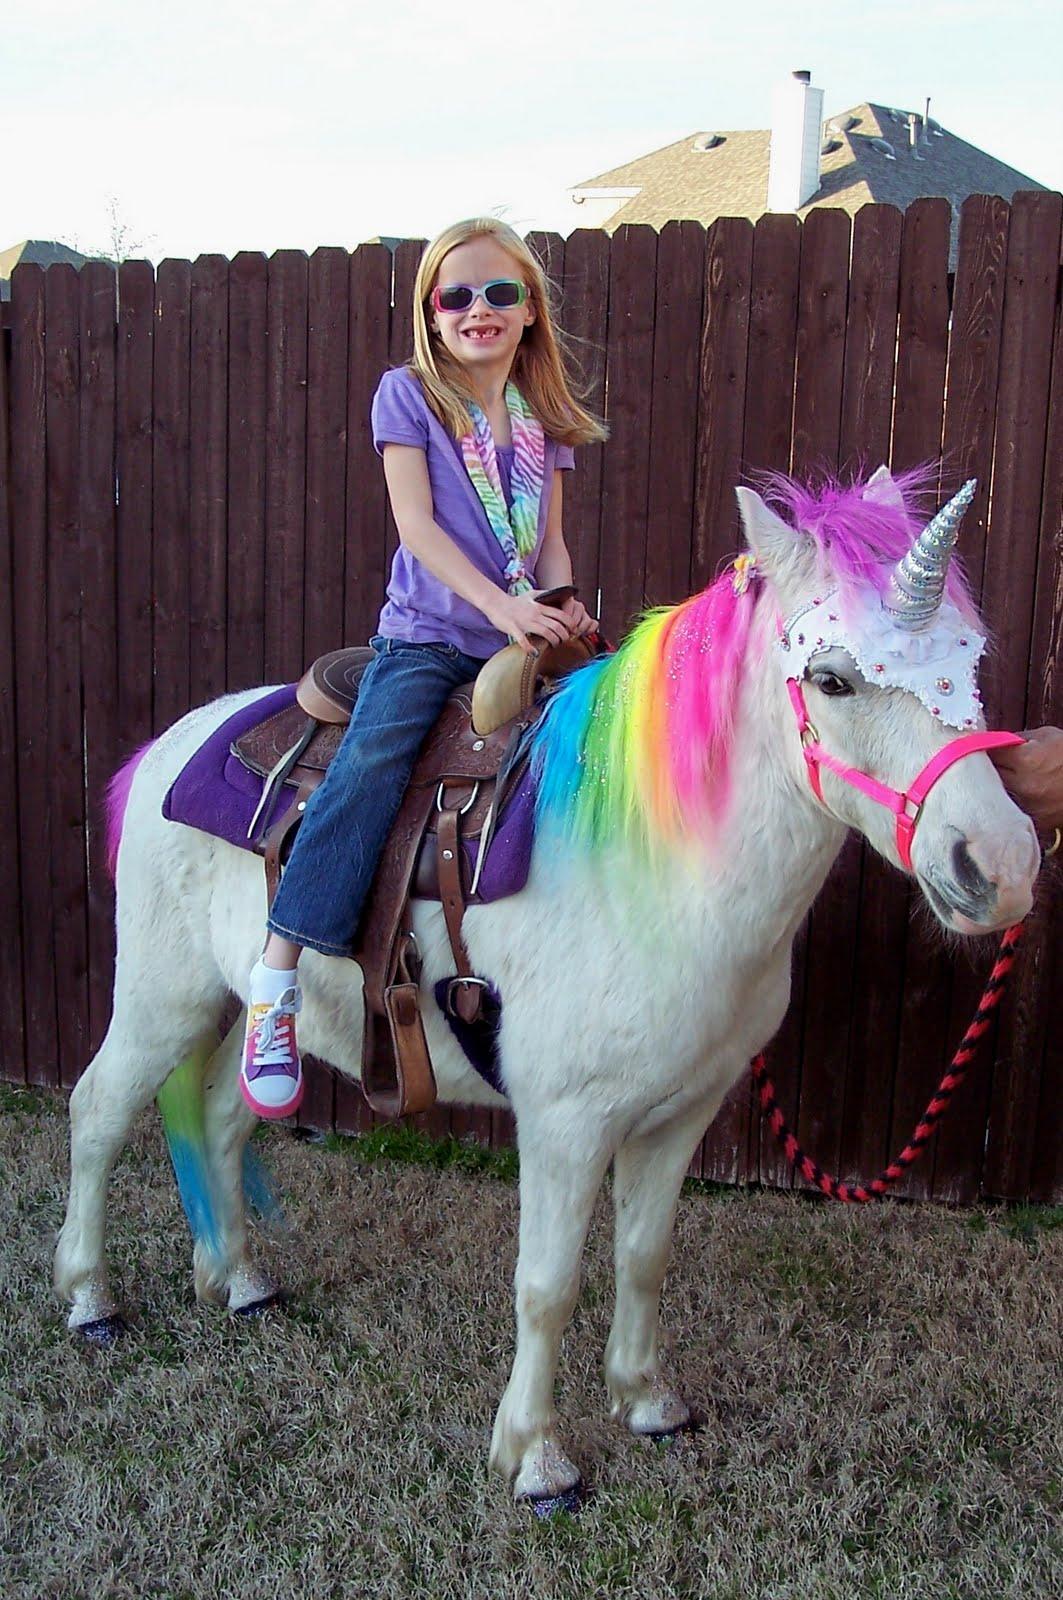 The Black Family: Brooke and the Rainbow Unicorn!